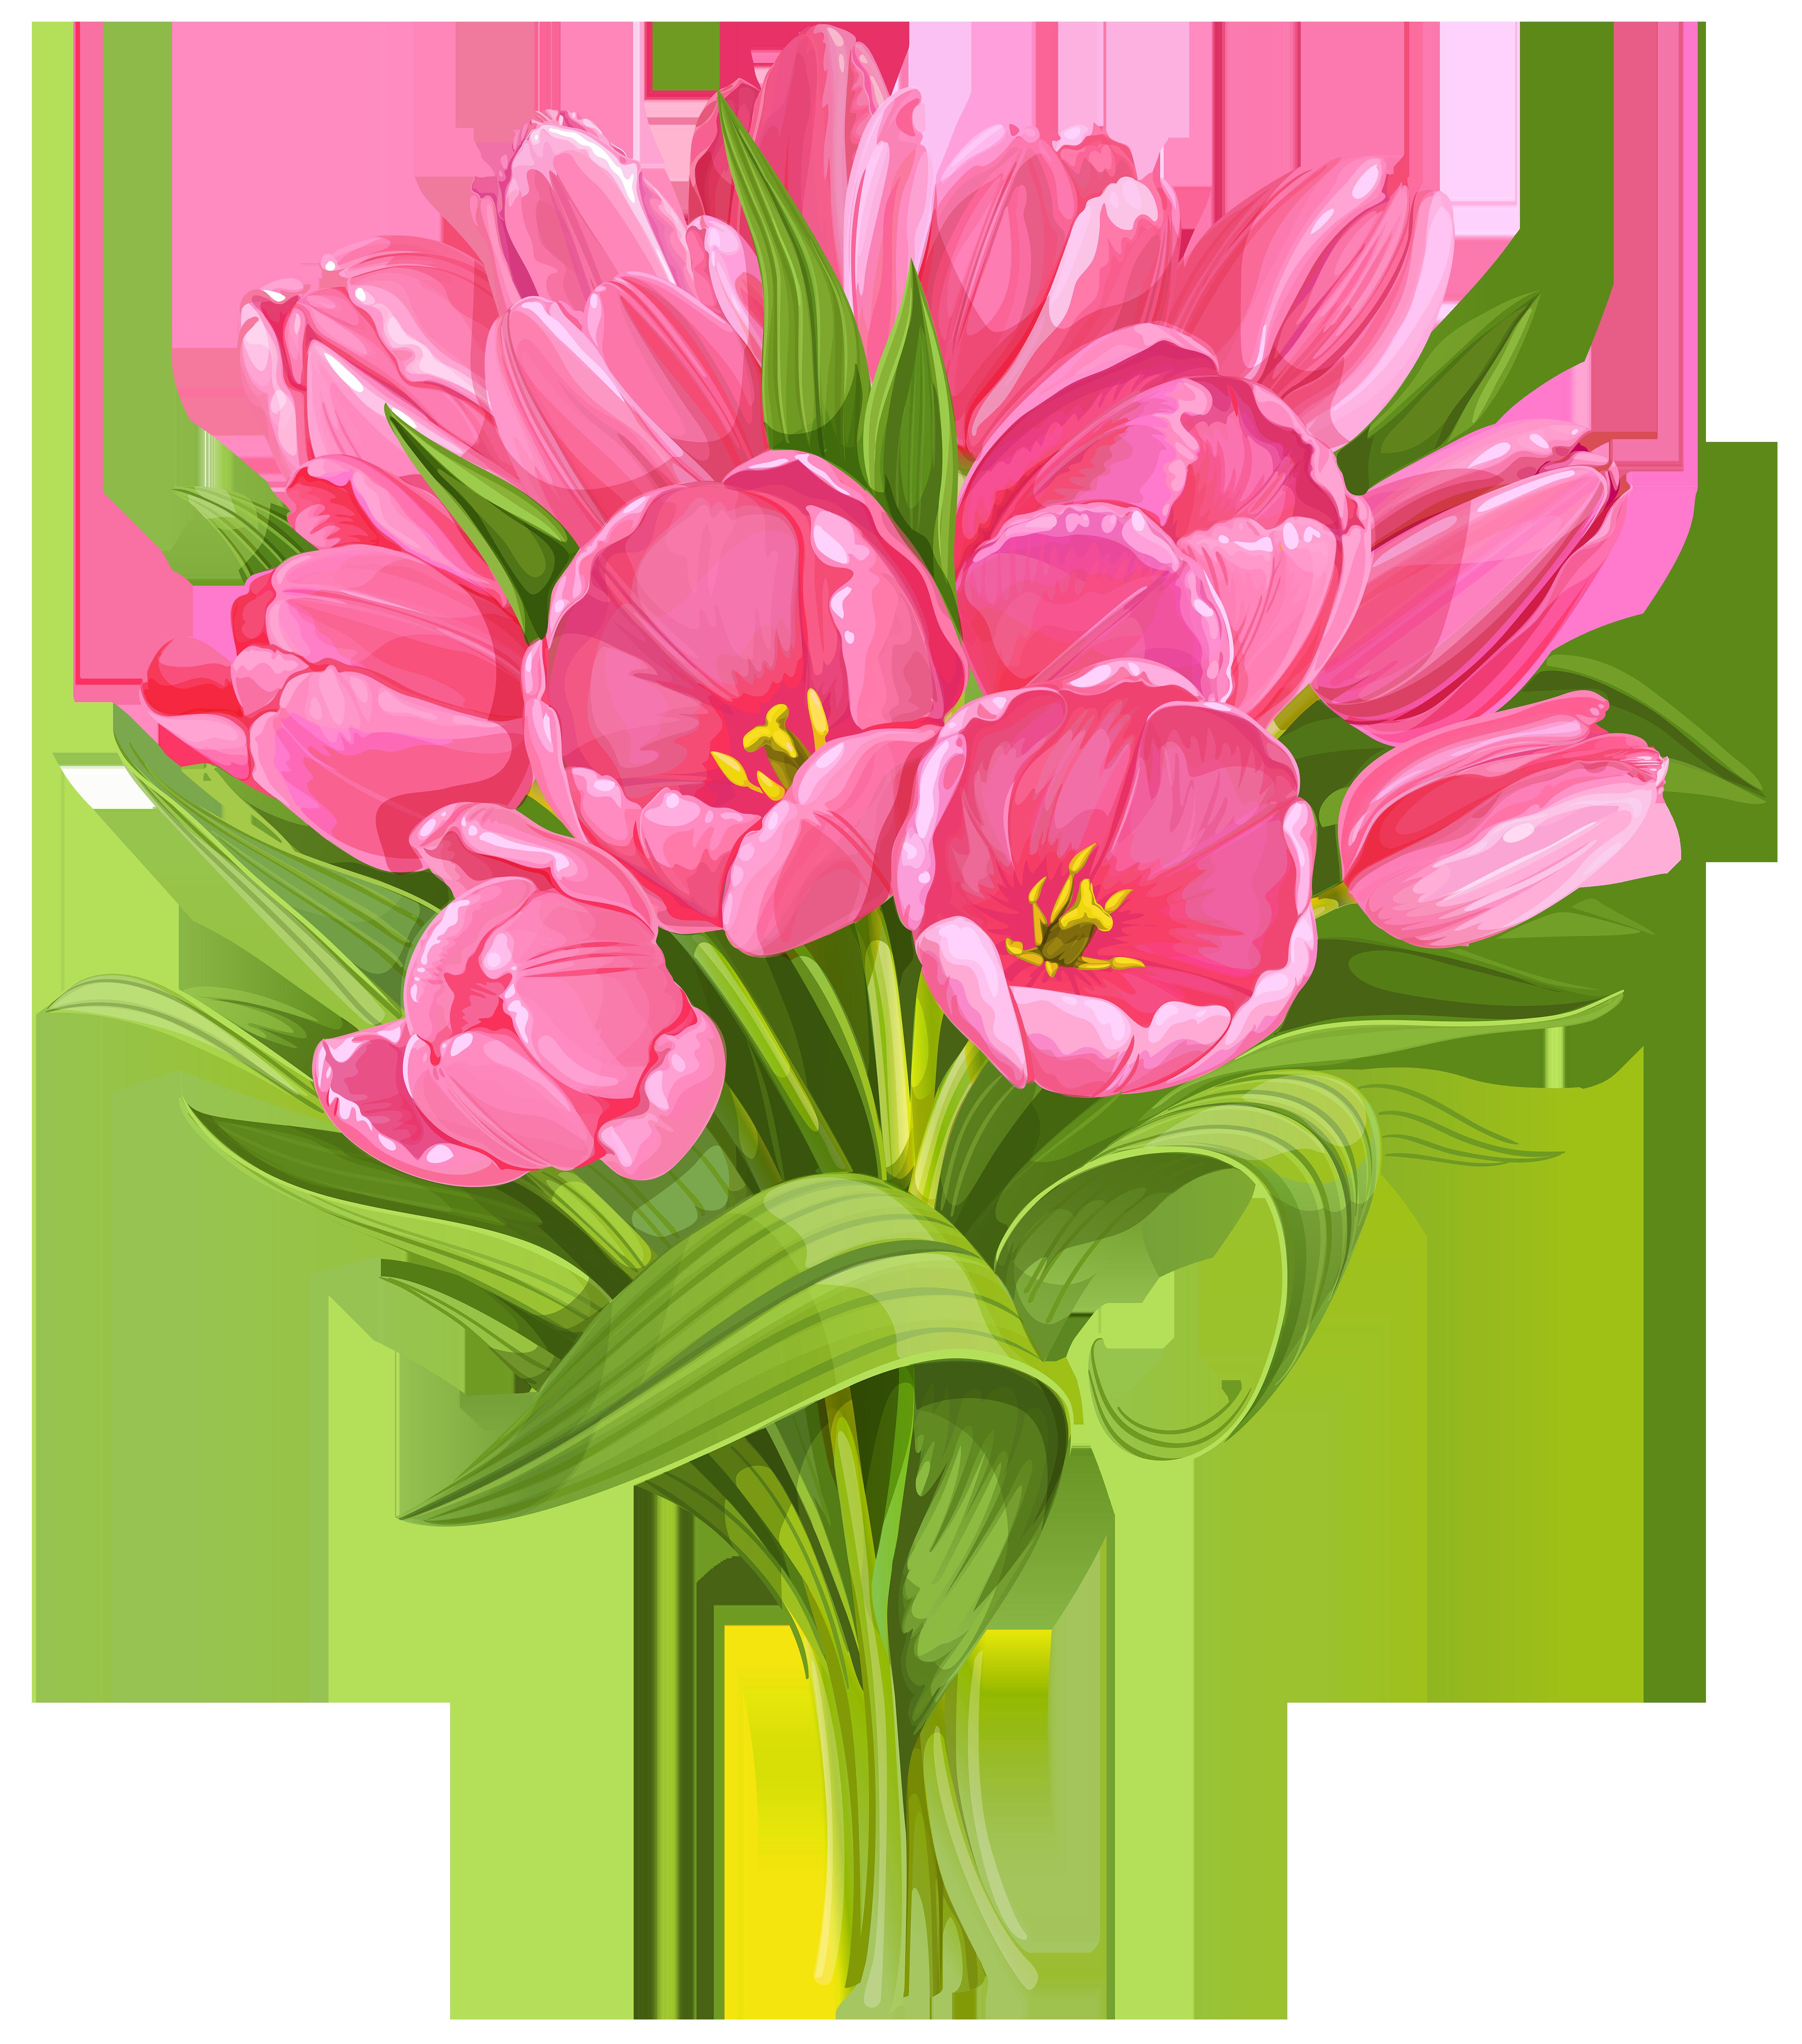 tulip clipart no background 8 Flower clipart, Tulip